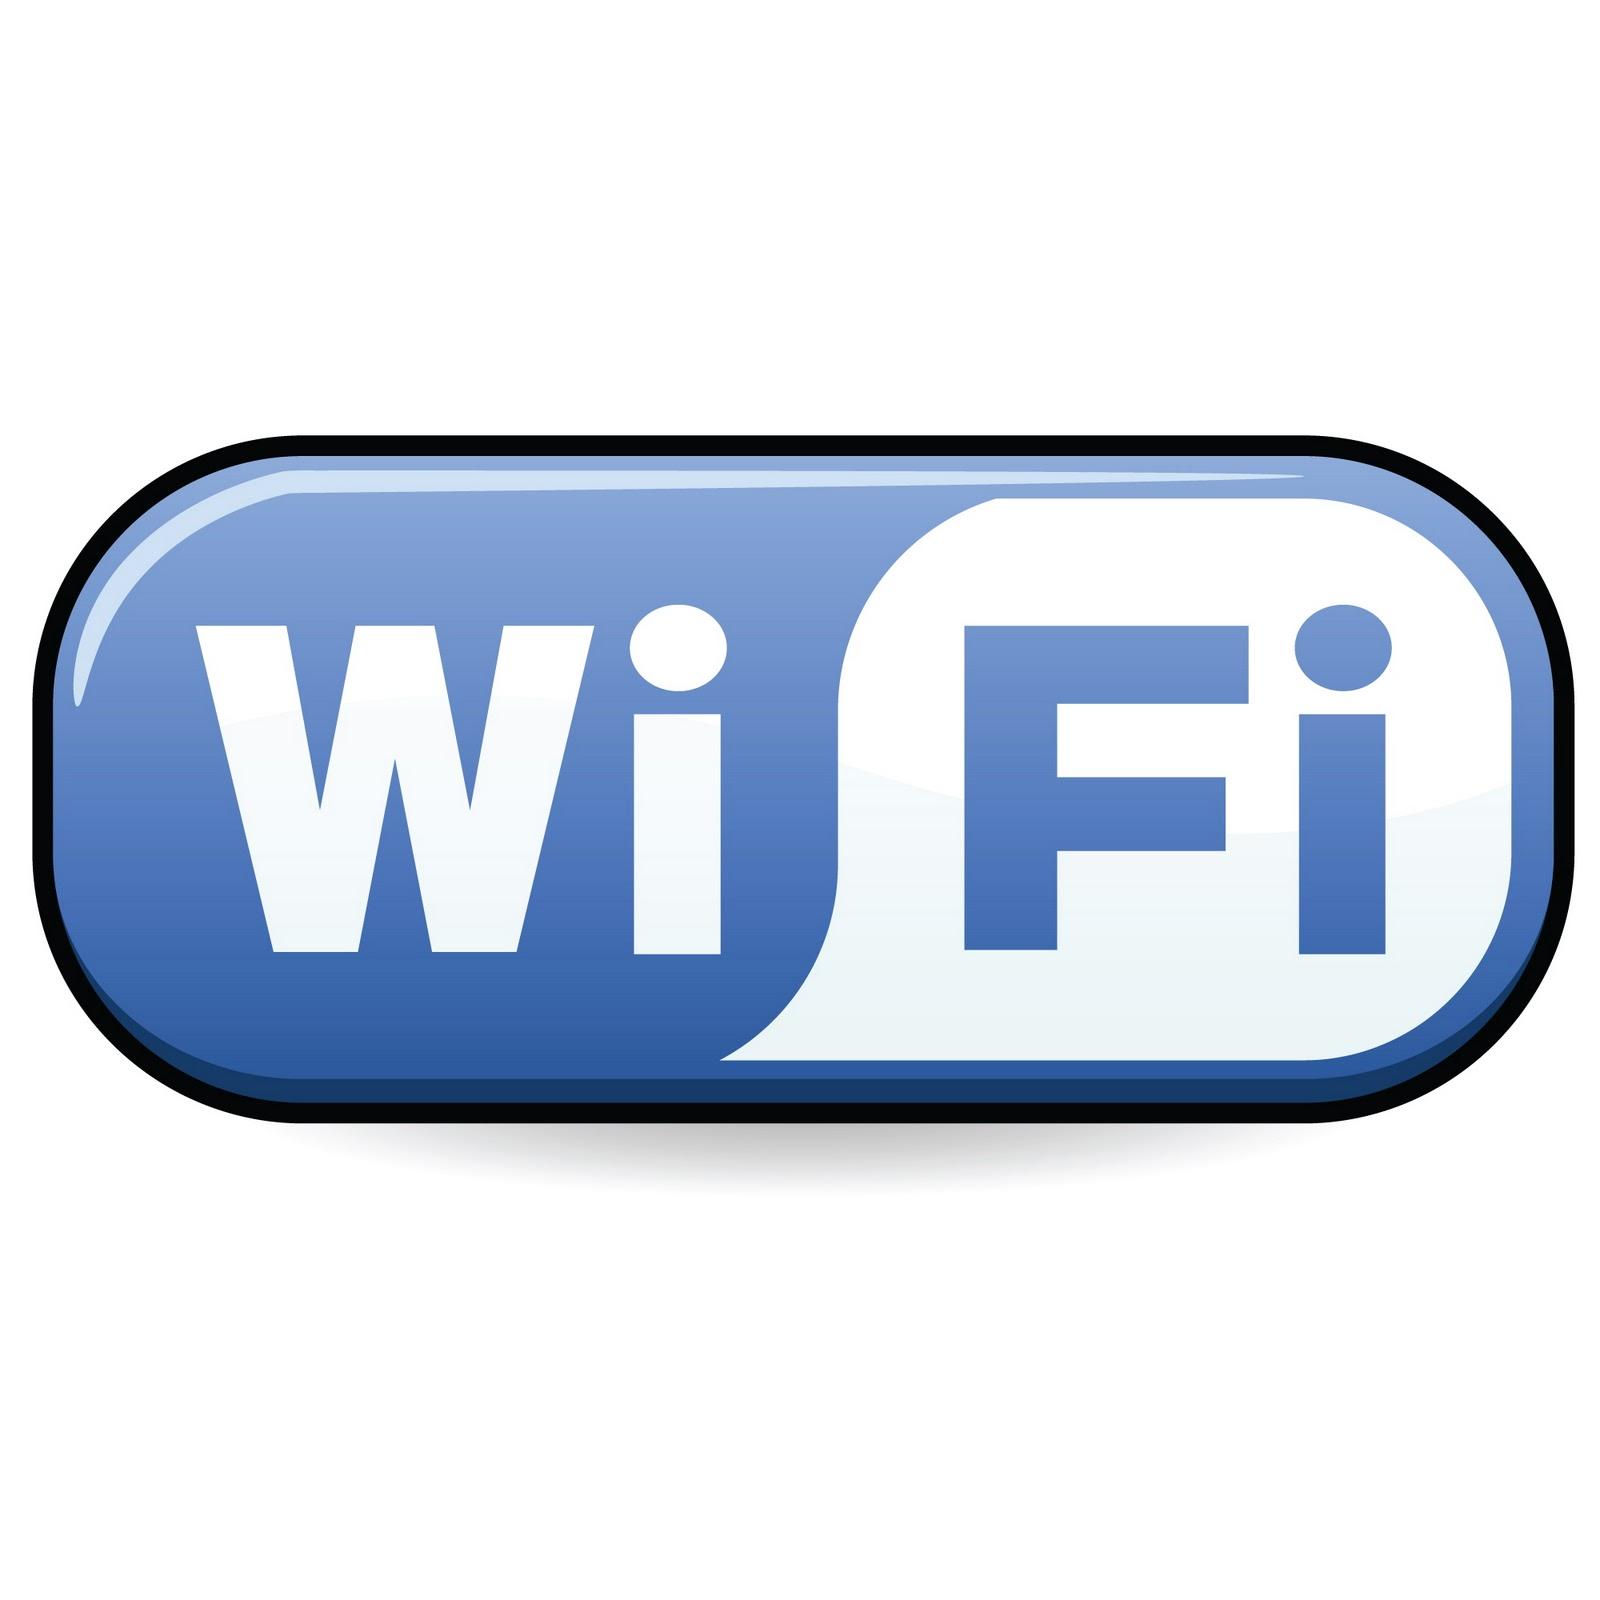 http://1.bp.blogspot.com/-OHAn5l02P4g/TuzMbIOoLyI/AAAAAAAAAPE/ZZwdyRznTRQ/s1600/blue_wifi.jpg